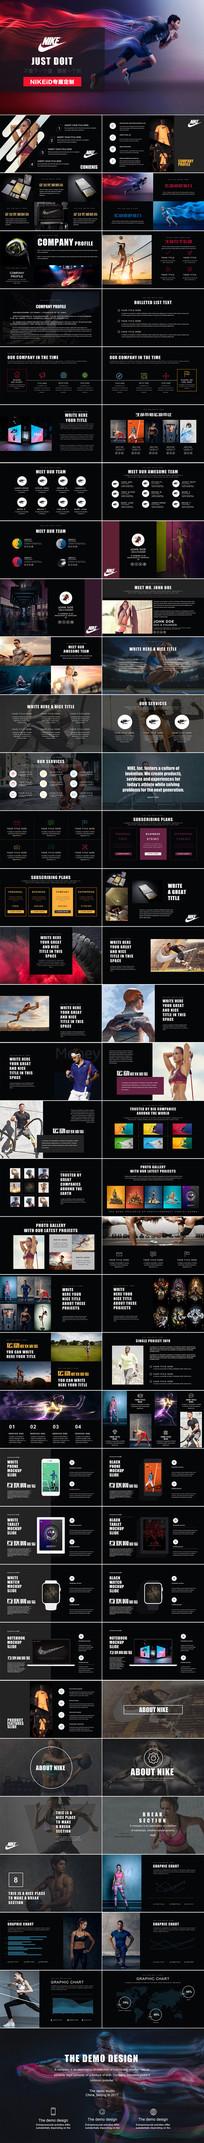 NIKE耐克时尚运动品牌营销策划PPT模板